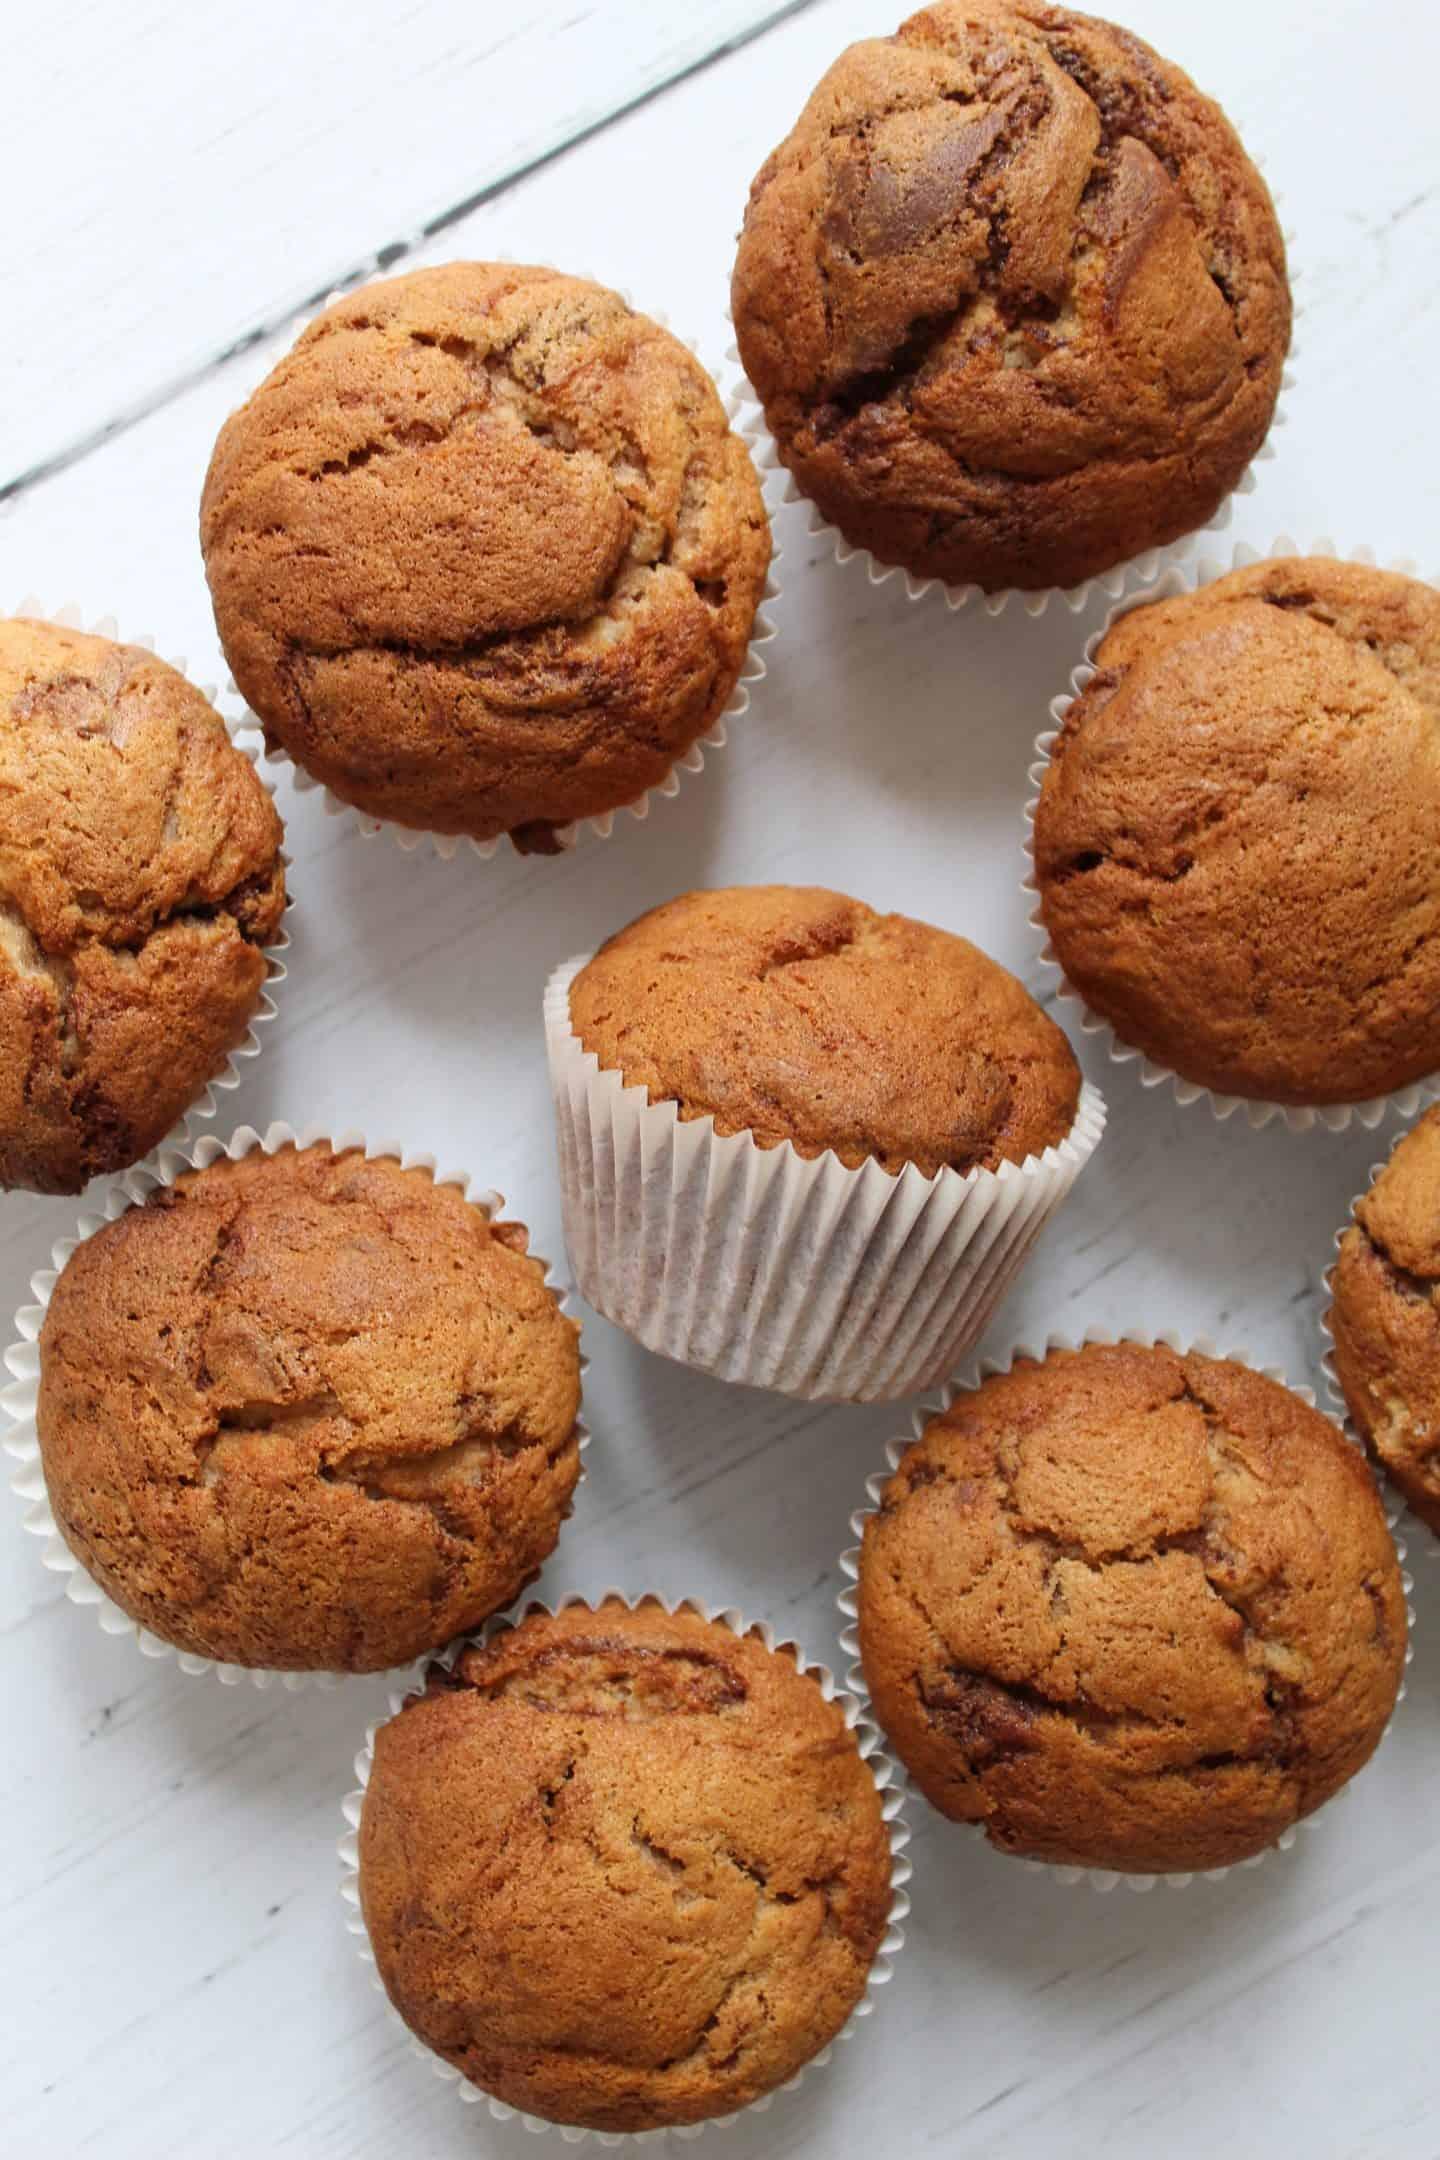 GLUTEN FREE NUTELLA BANANA MUFFINS RECIPE